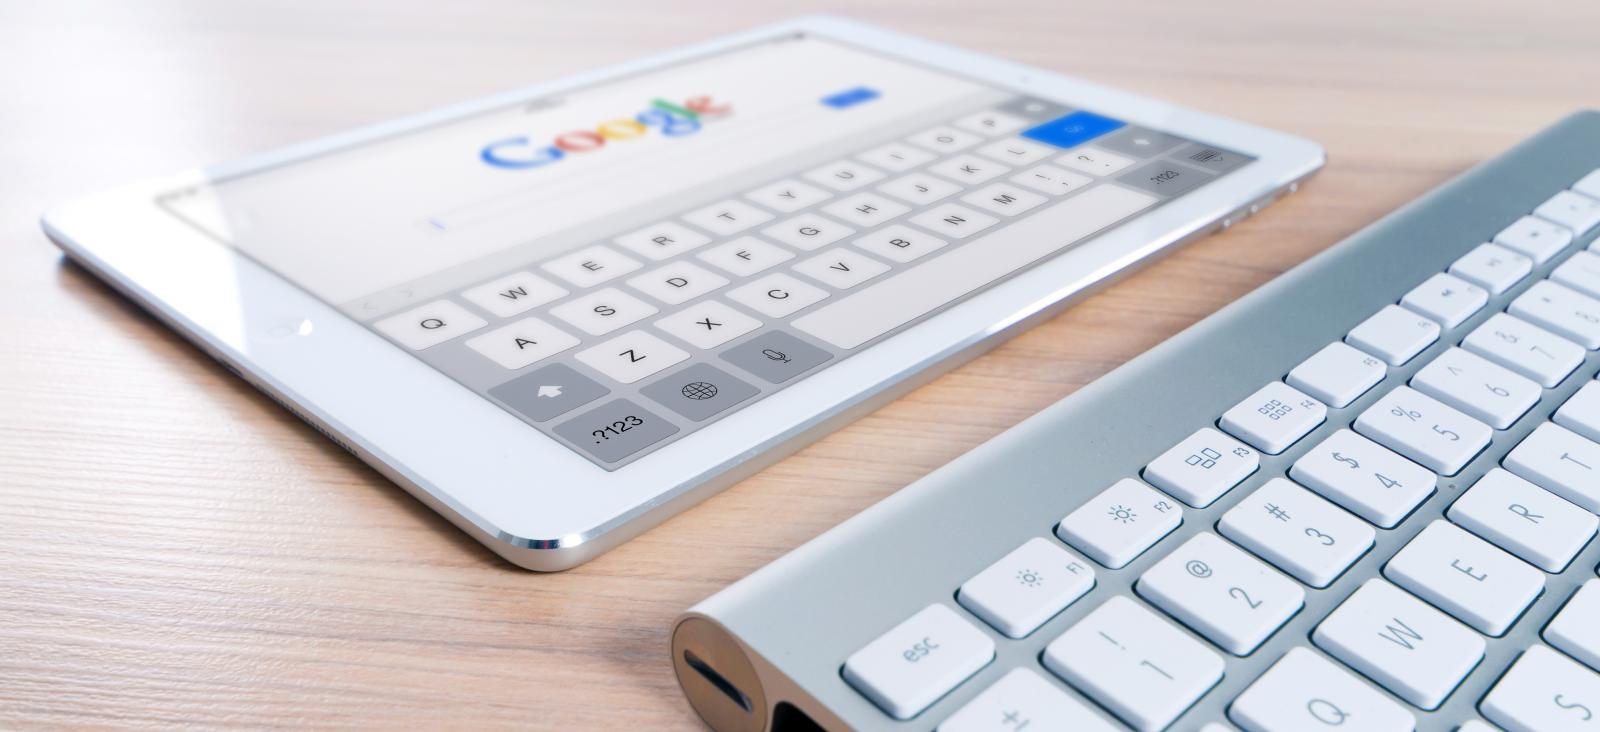 iPad und Apple Tastatur   Foto von Pexels